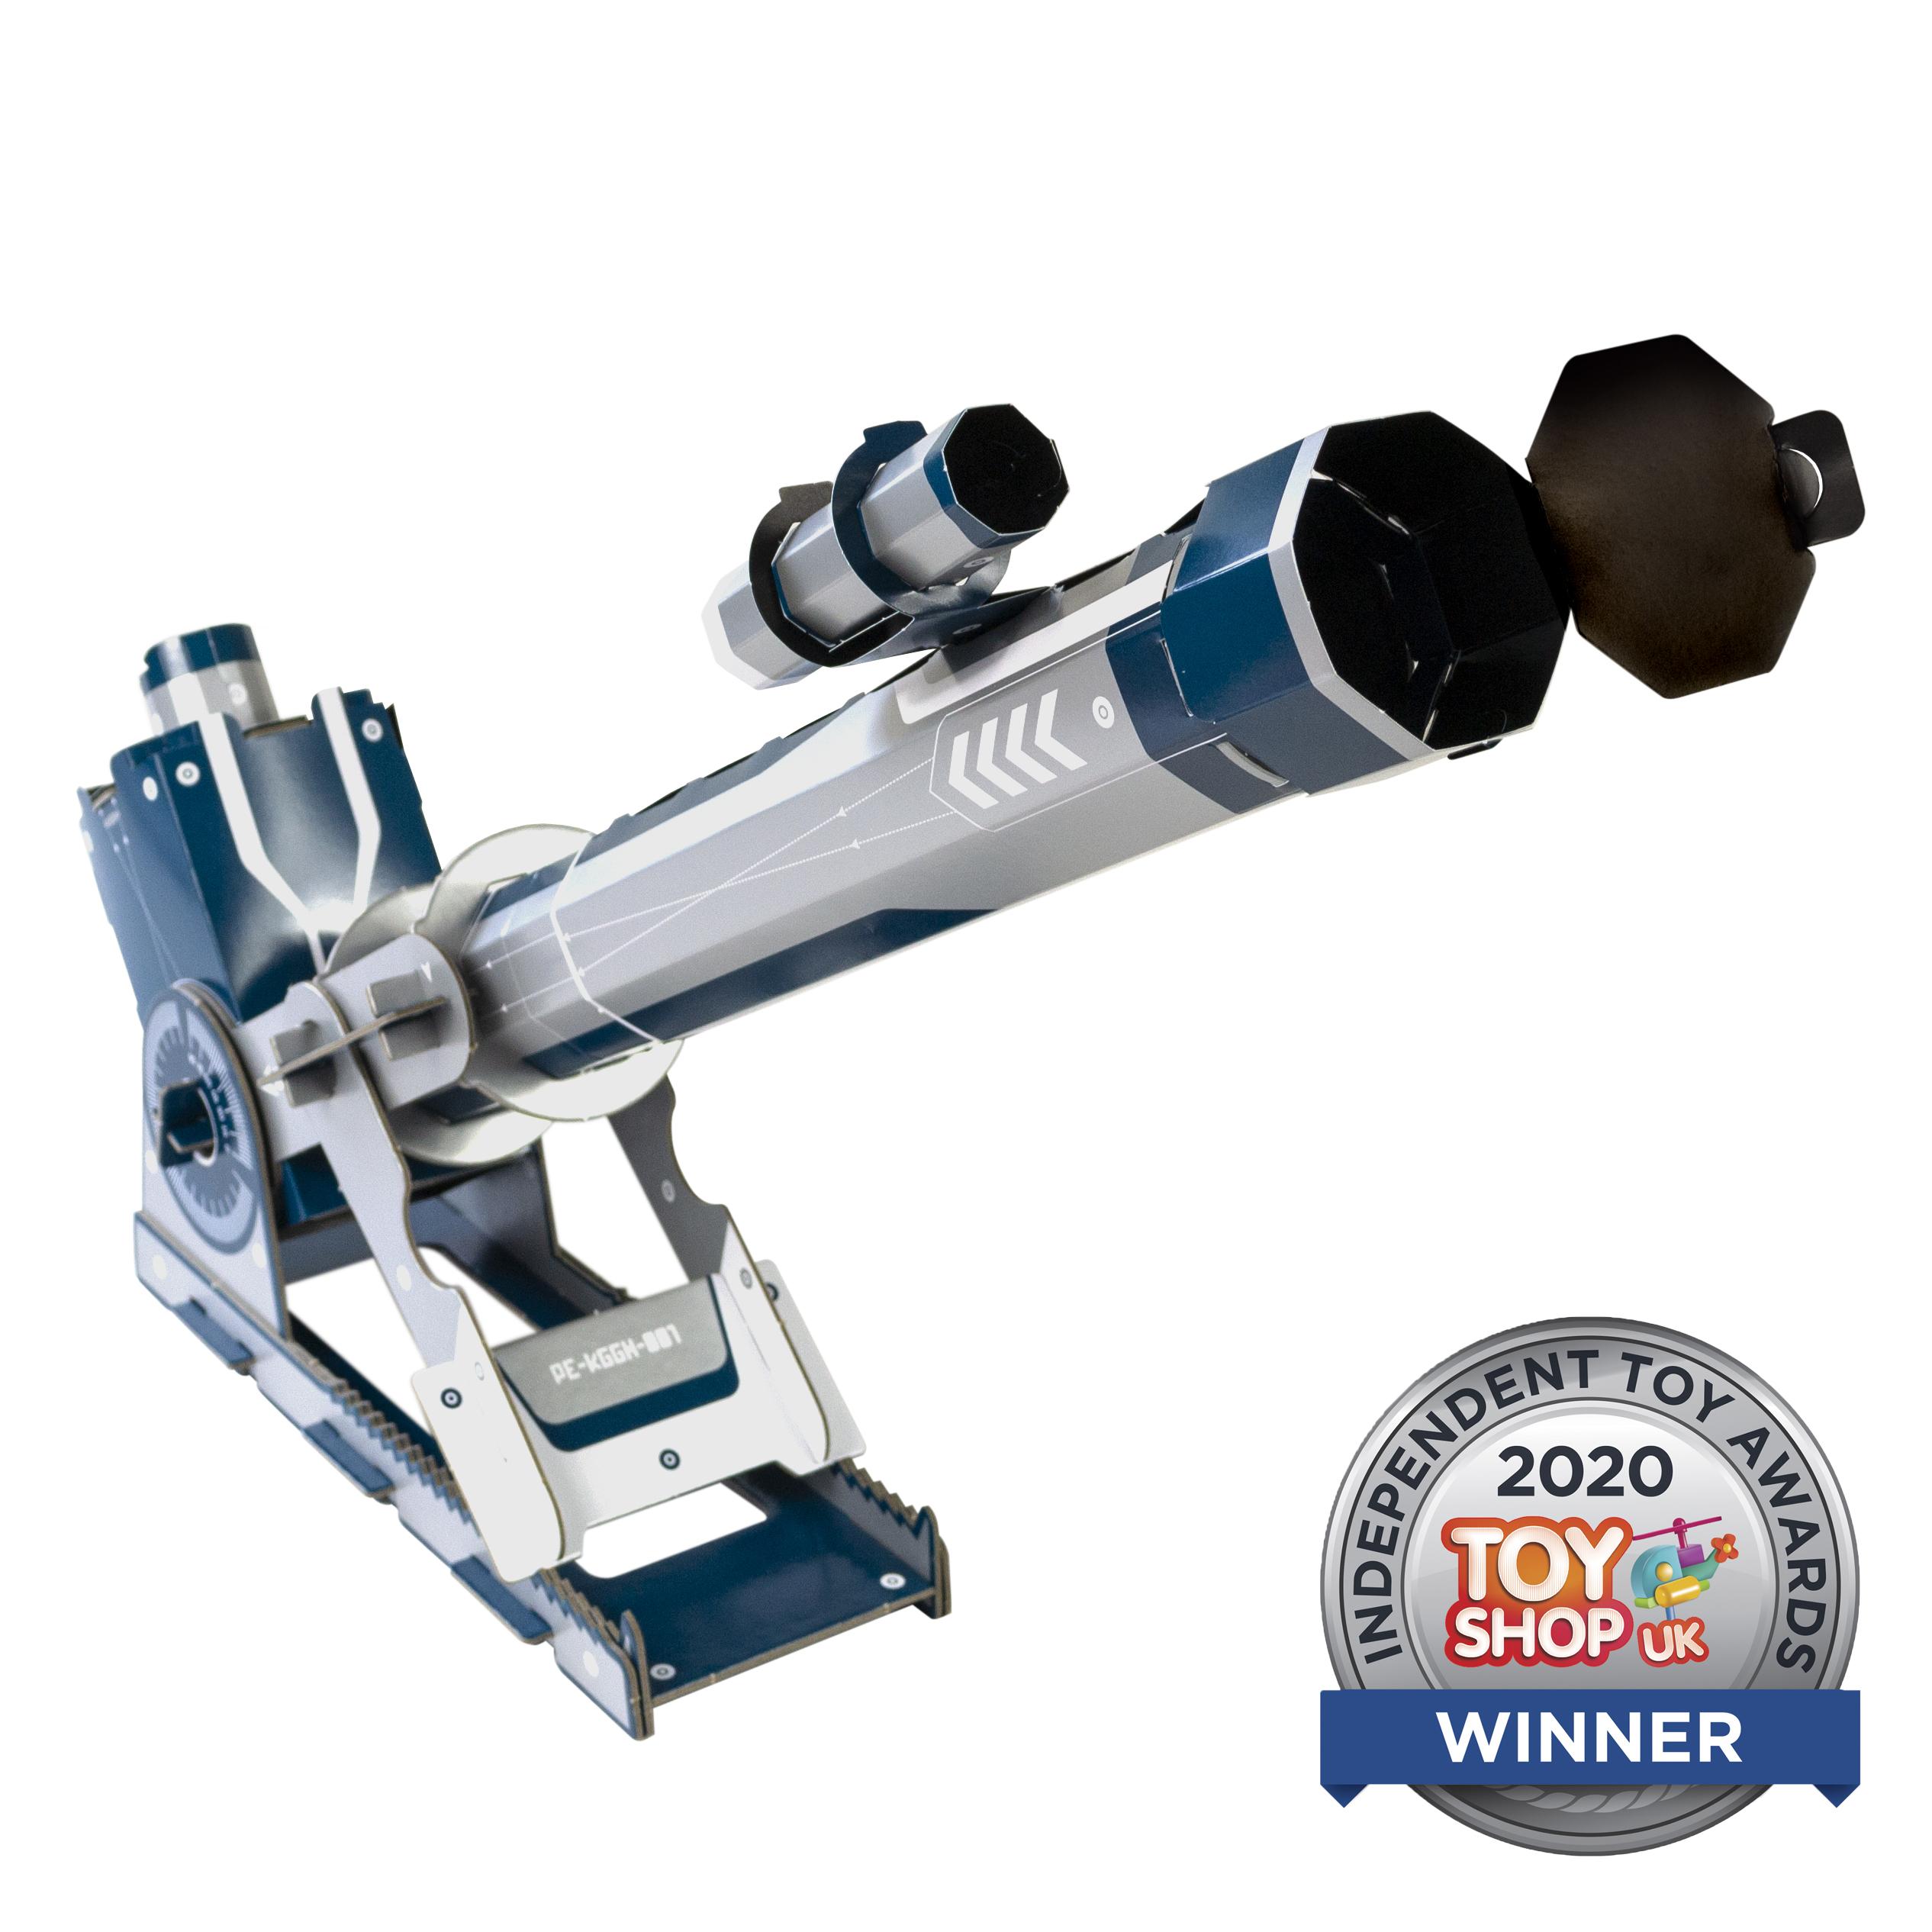 Telescope and Plane Launcher